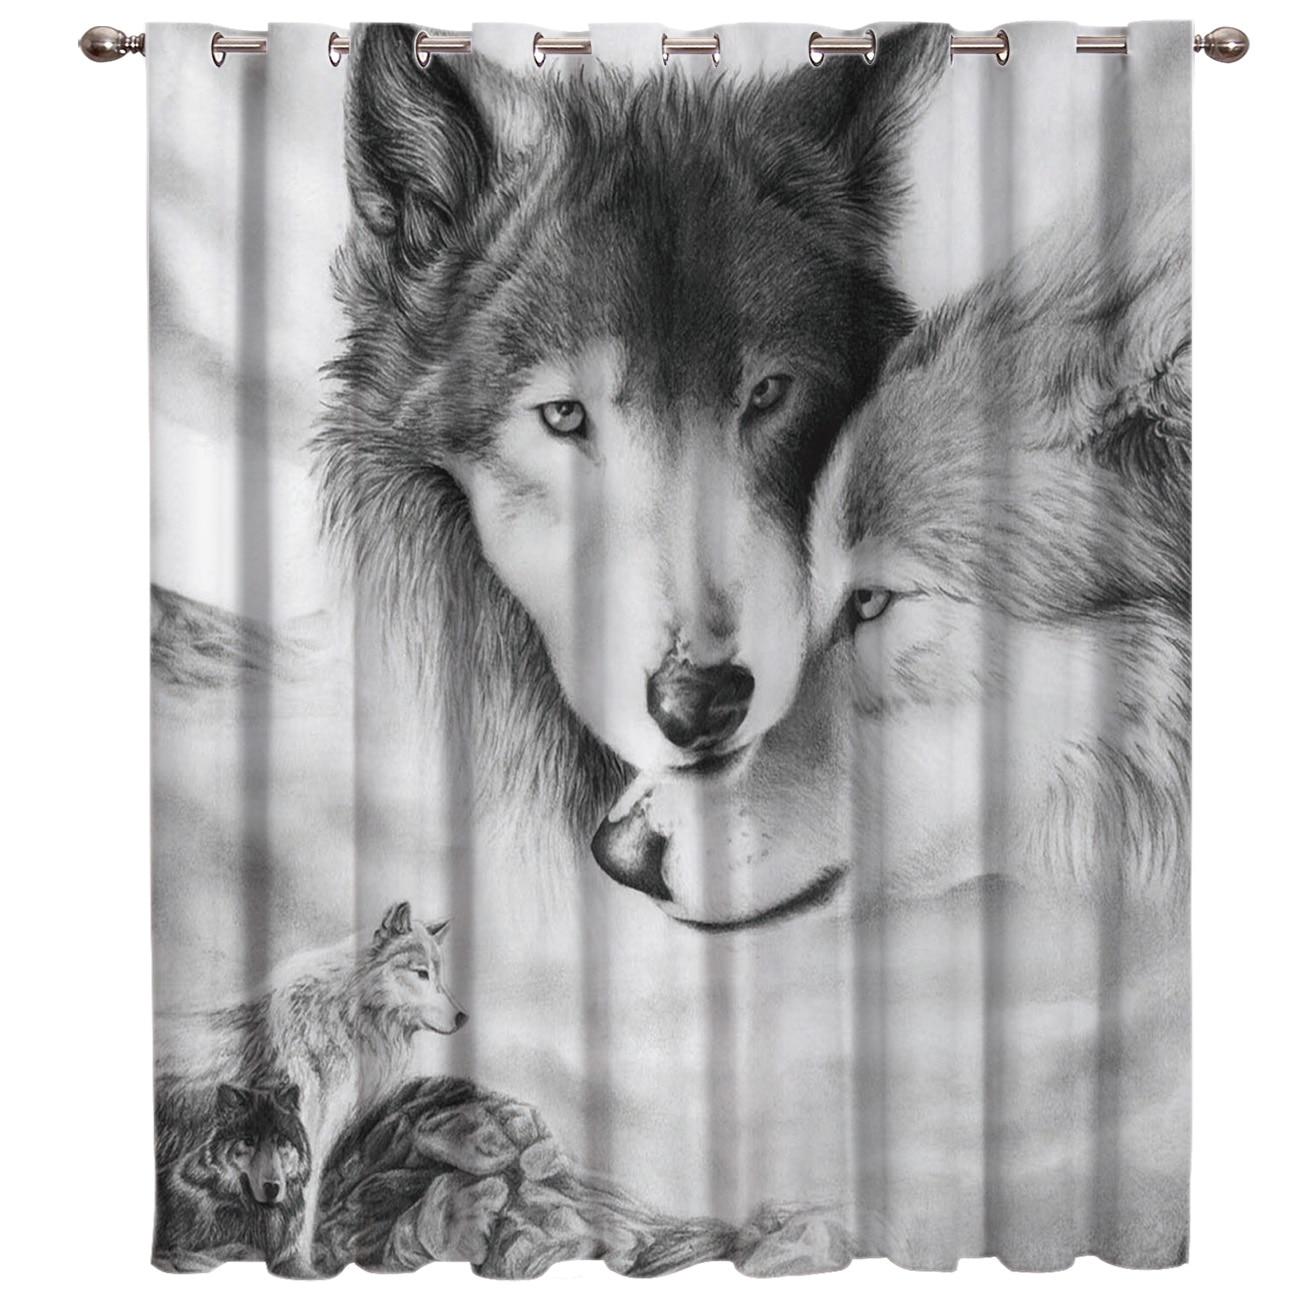 Wolf Love Black And White Window Treatments Curtains Valance Bedroom Decor Kids Window Treatment Hardware Sets Window Treatment